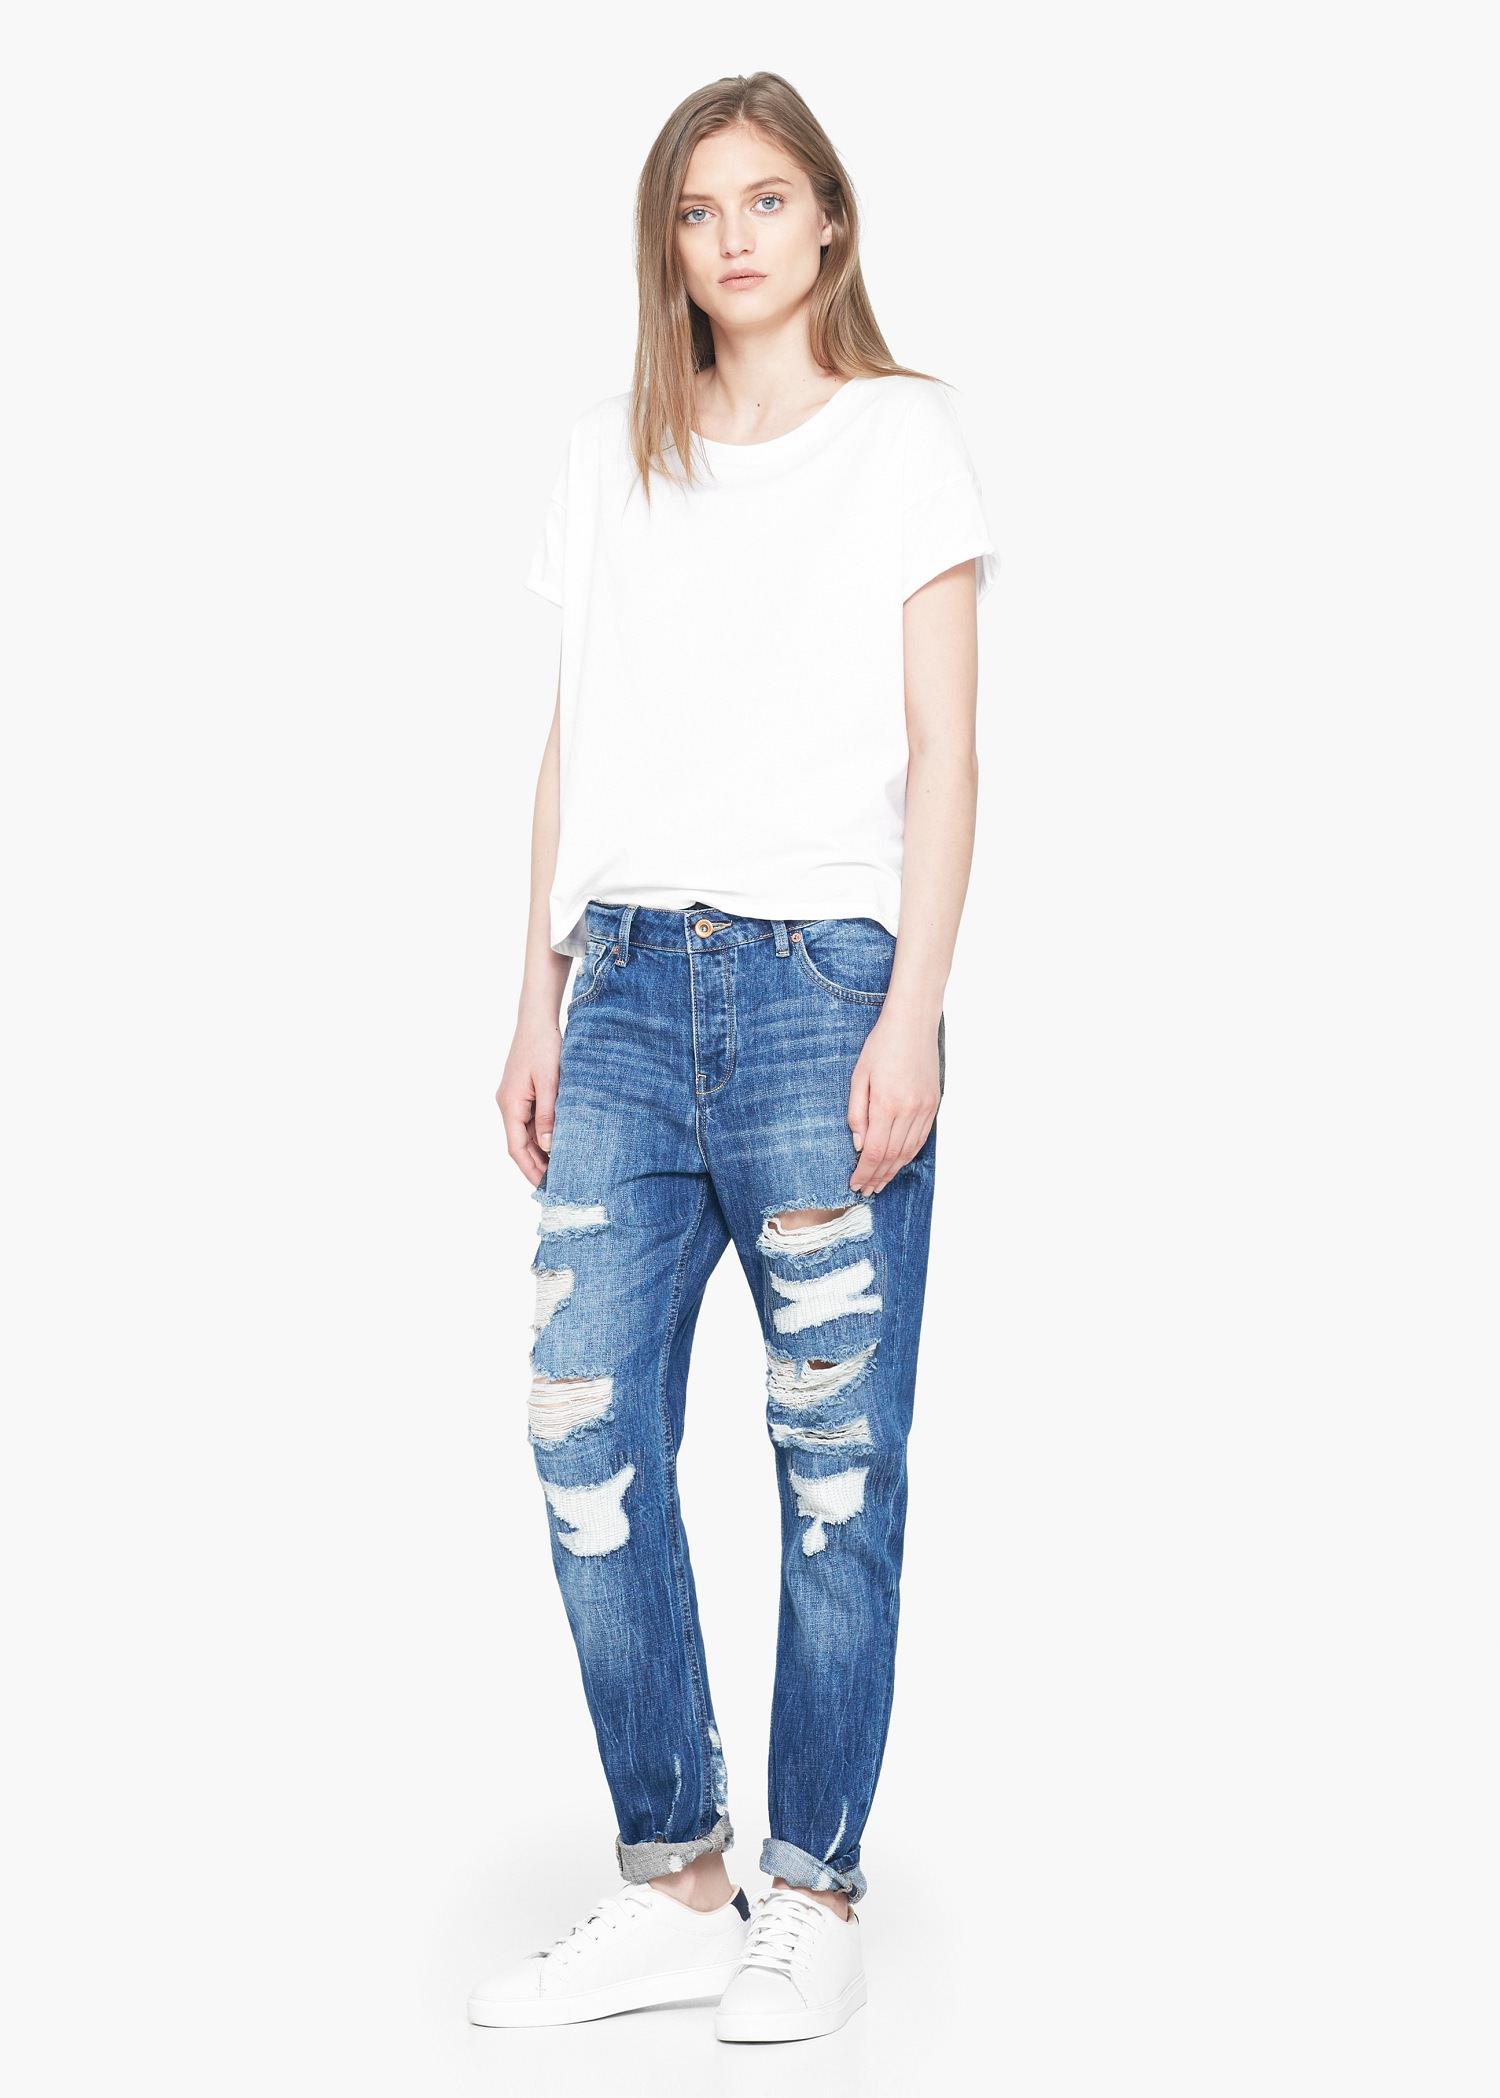 Mango Boyfriend Angie Jeans in Blue